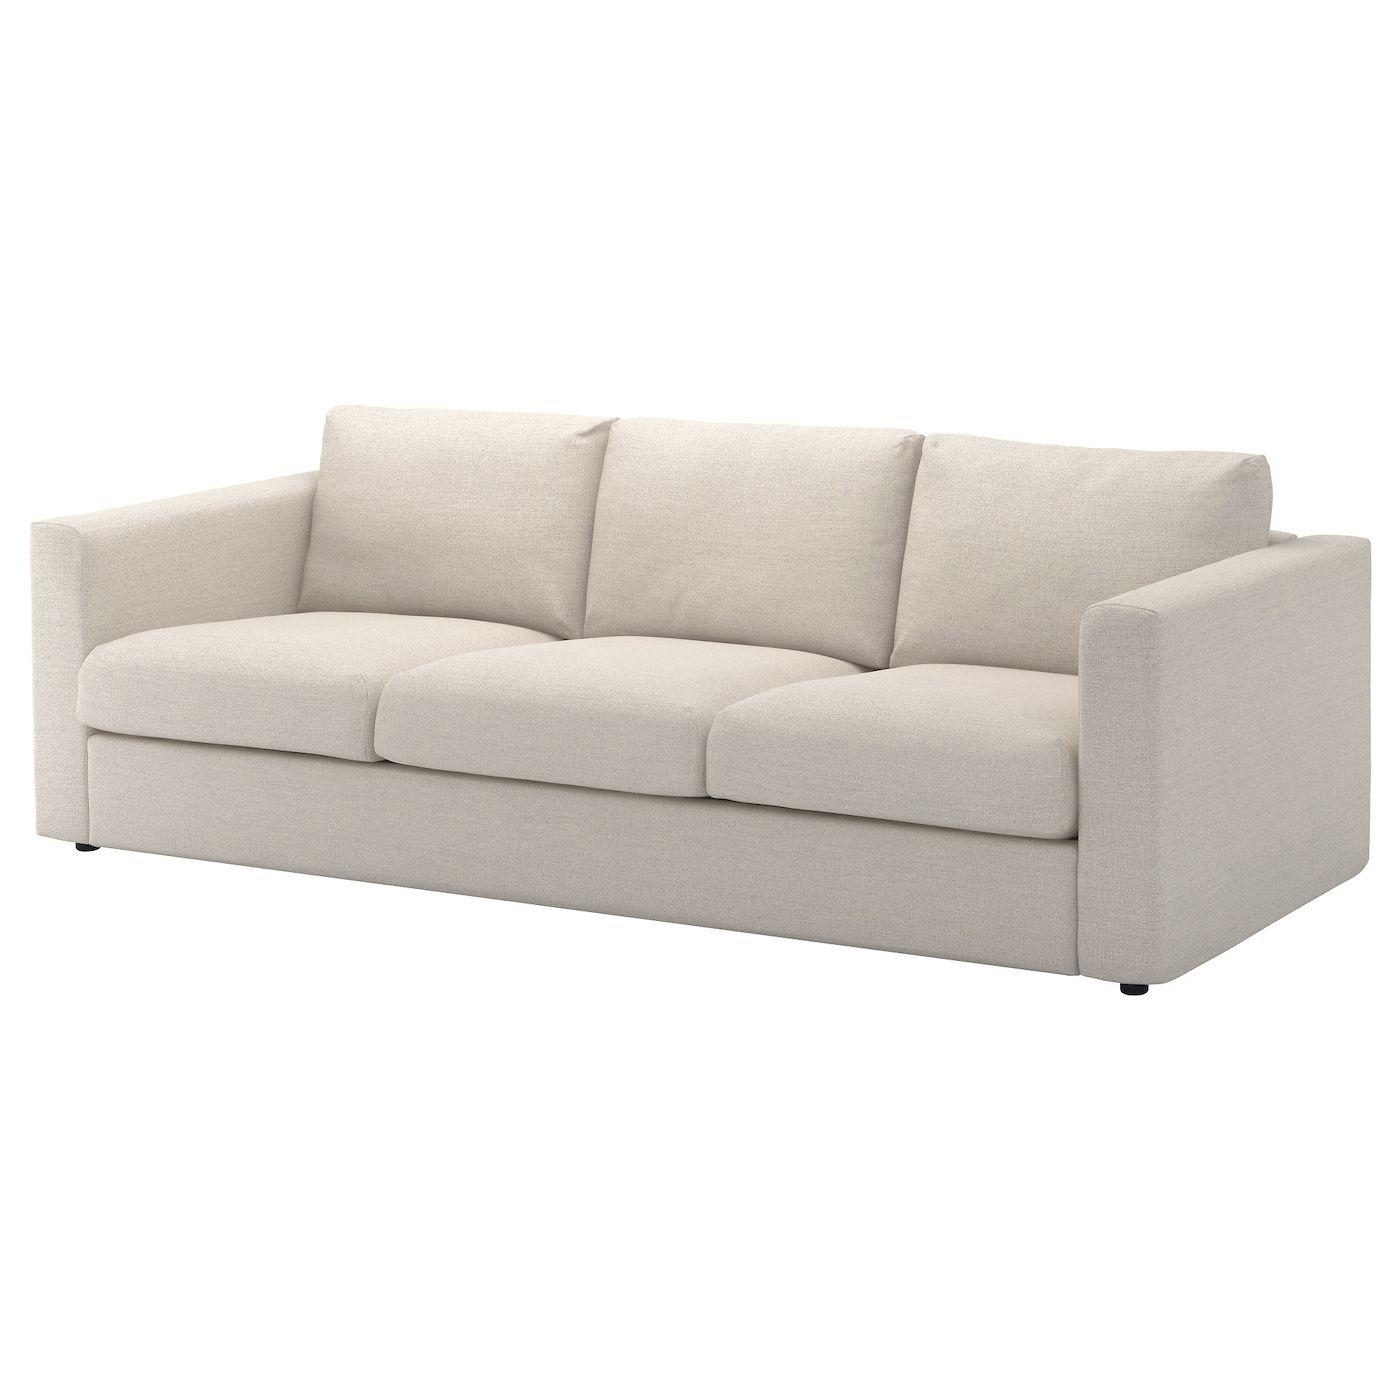 Ikea Vimle Sofa Sofa De 3 Plazas Cojines De Los Asientos Sofas Modulares